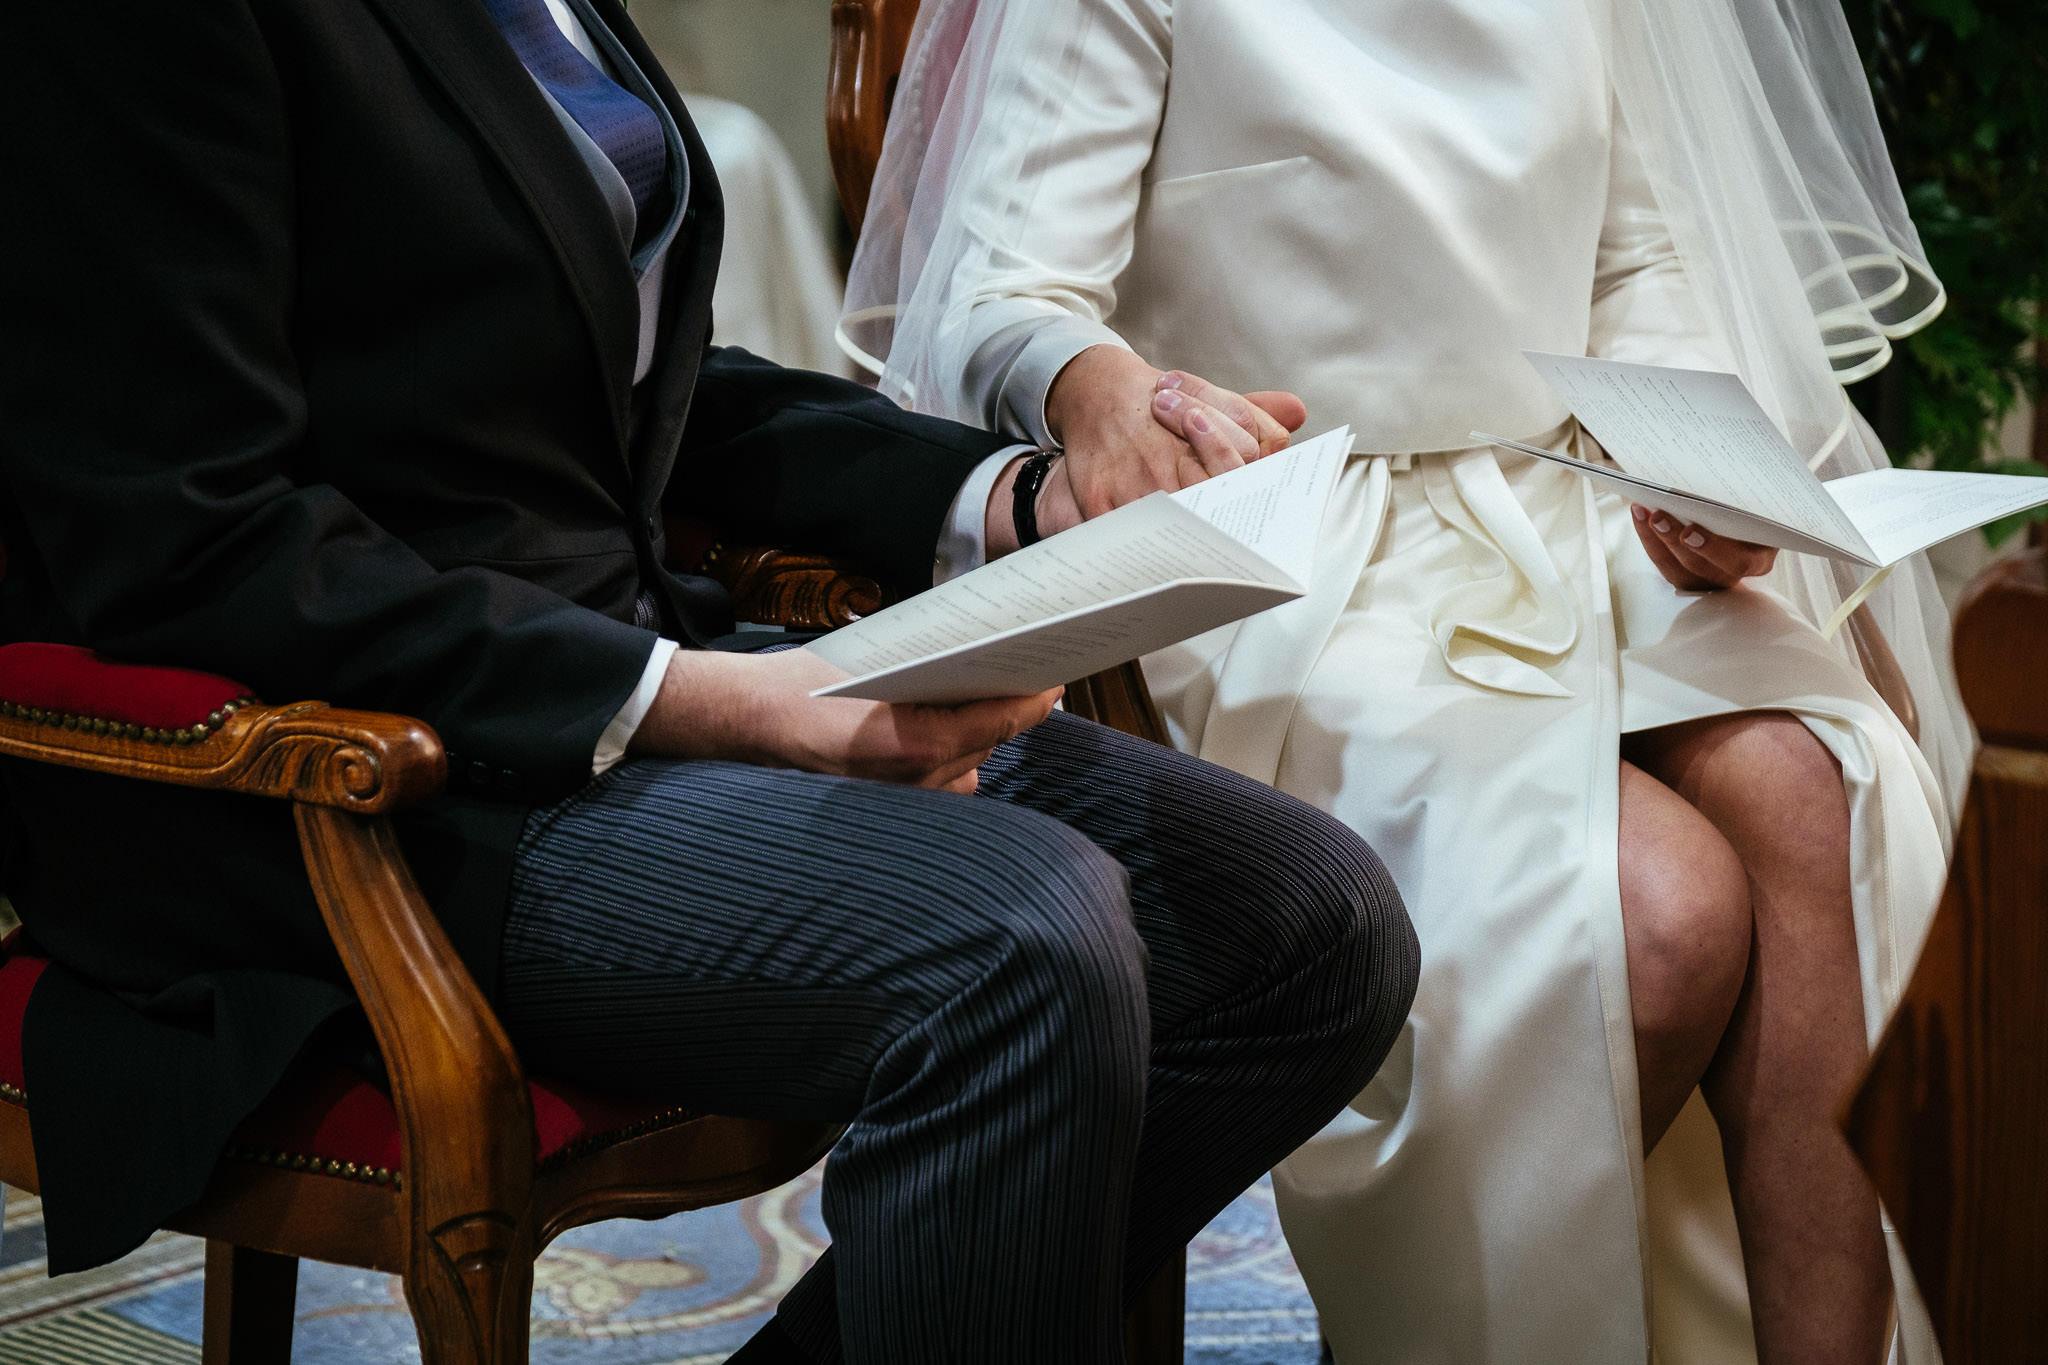 Virginia park lodge Wedding Photographer 61